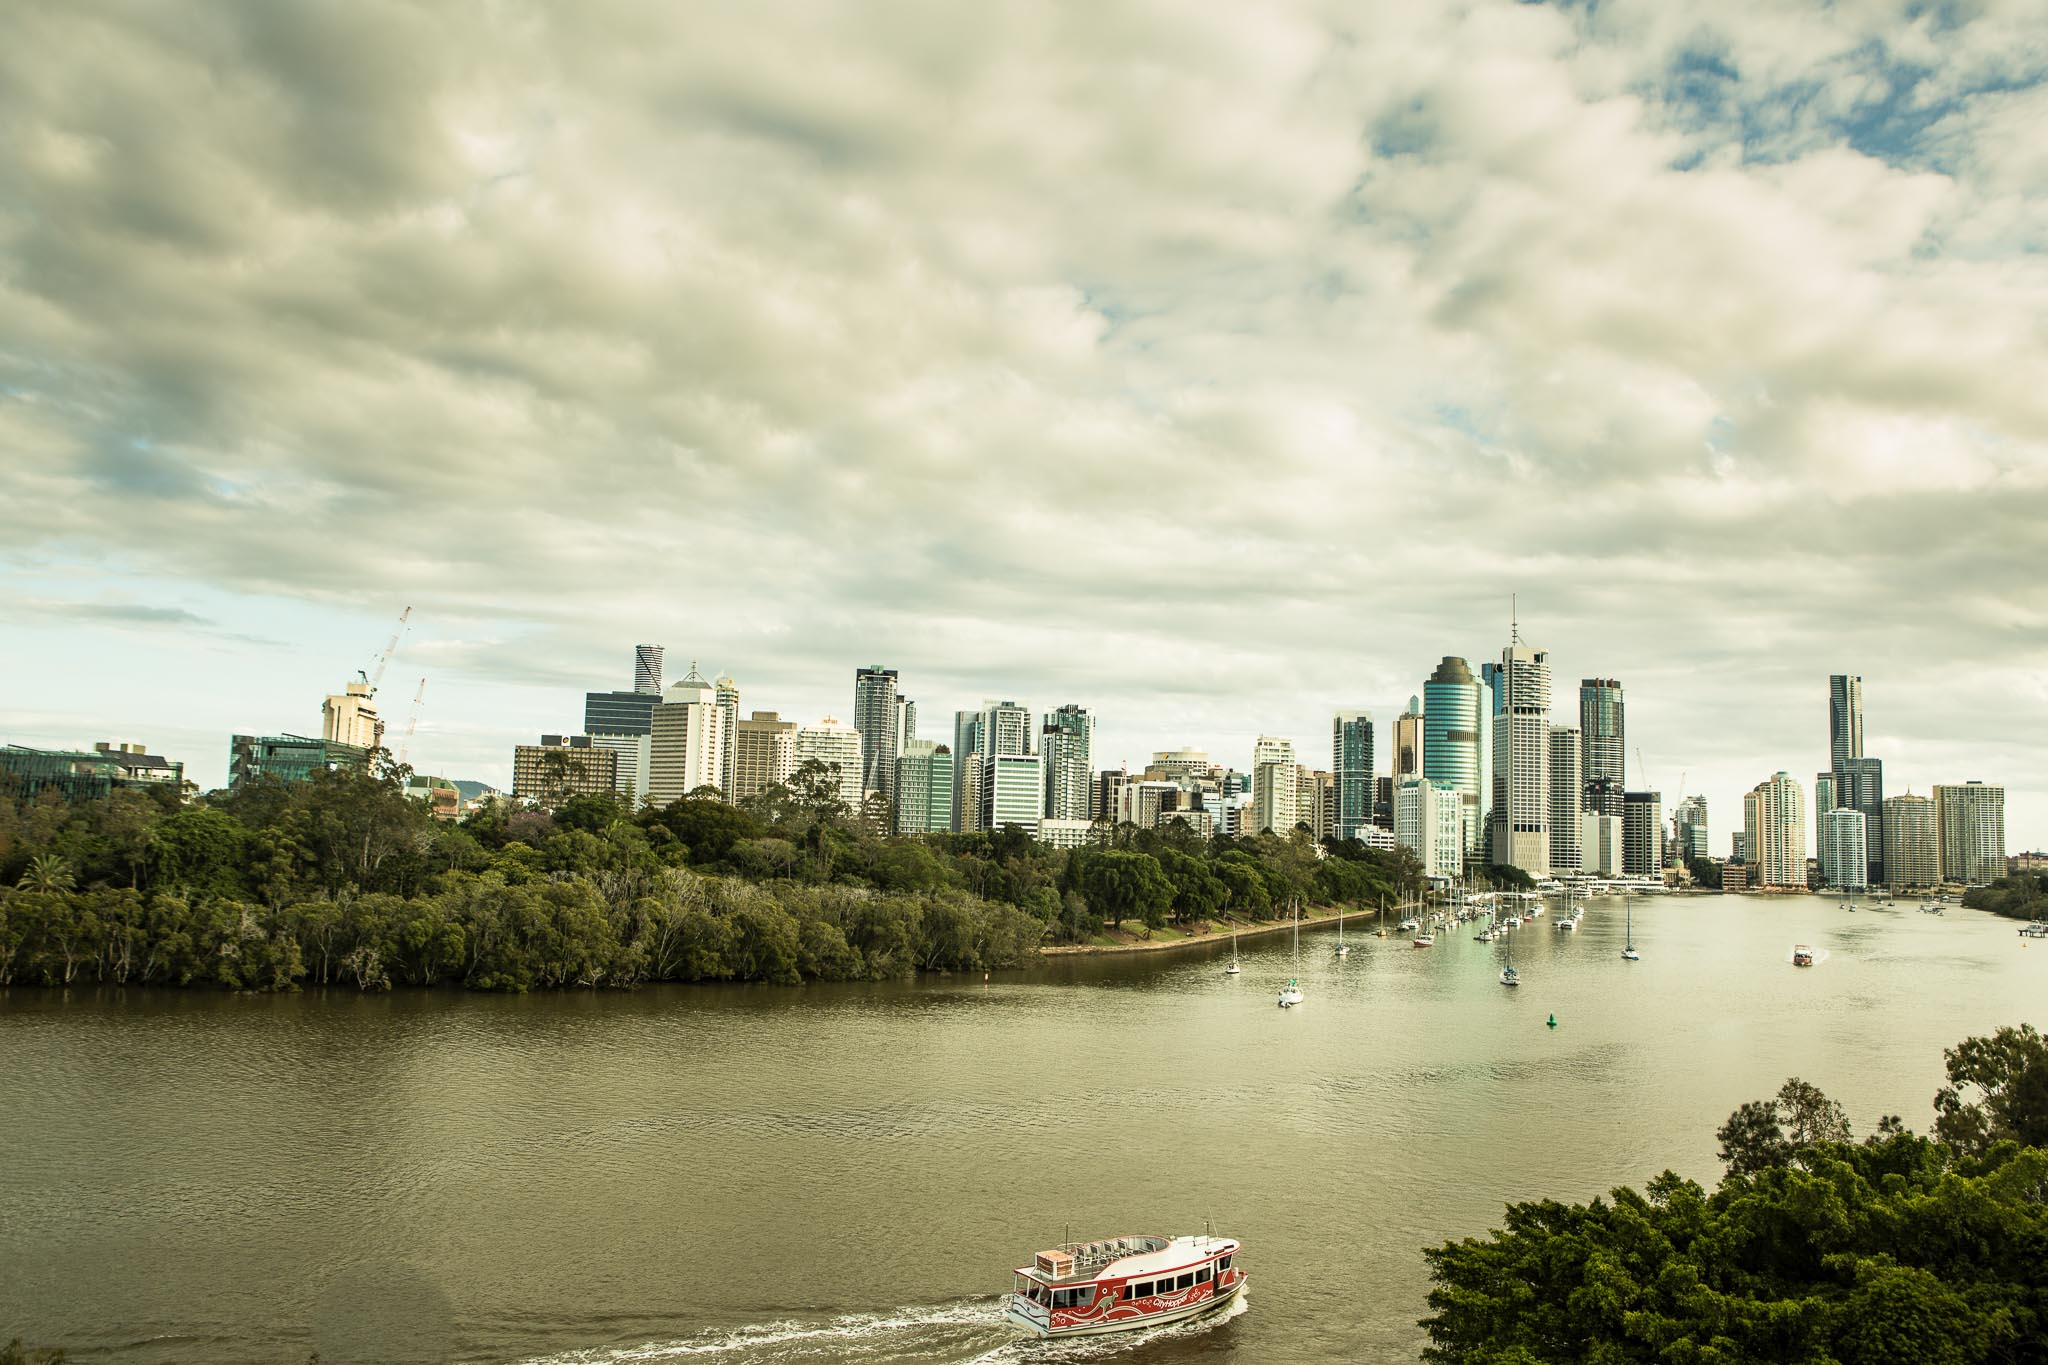 Brisbane Photography Workshop - Day & Night